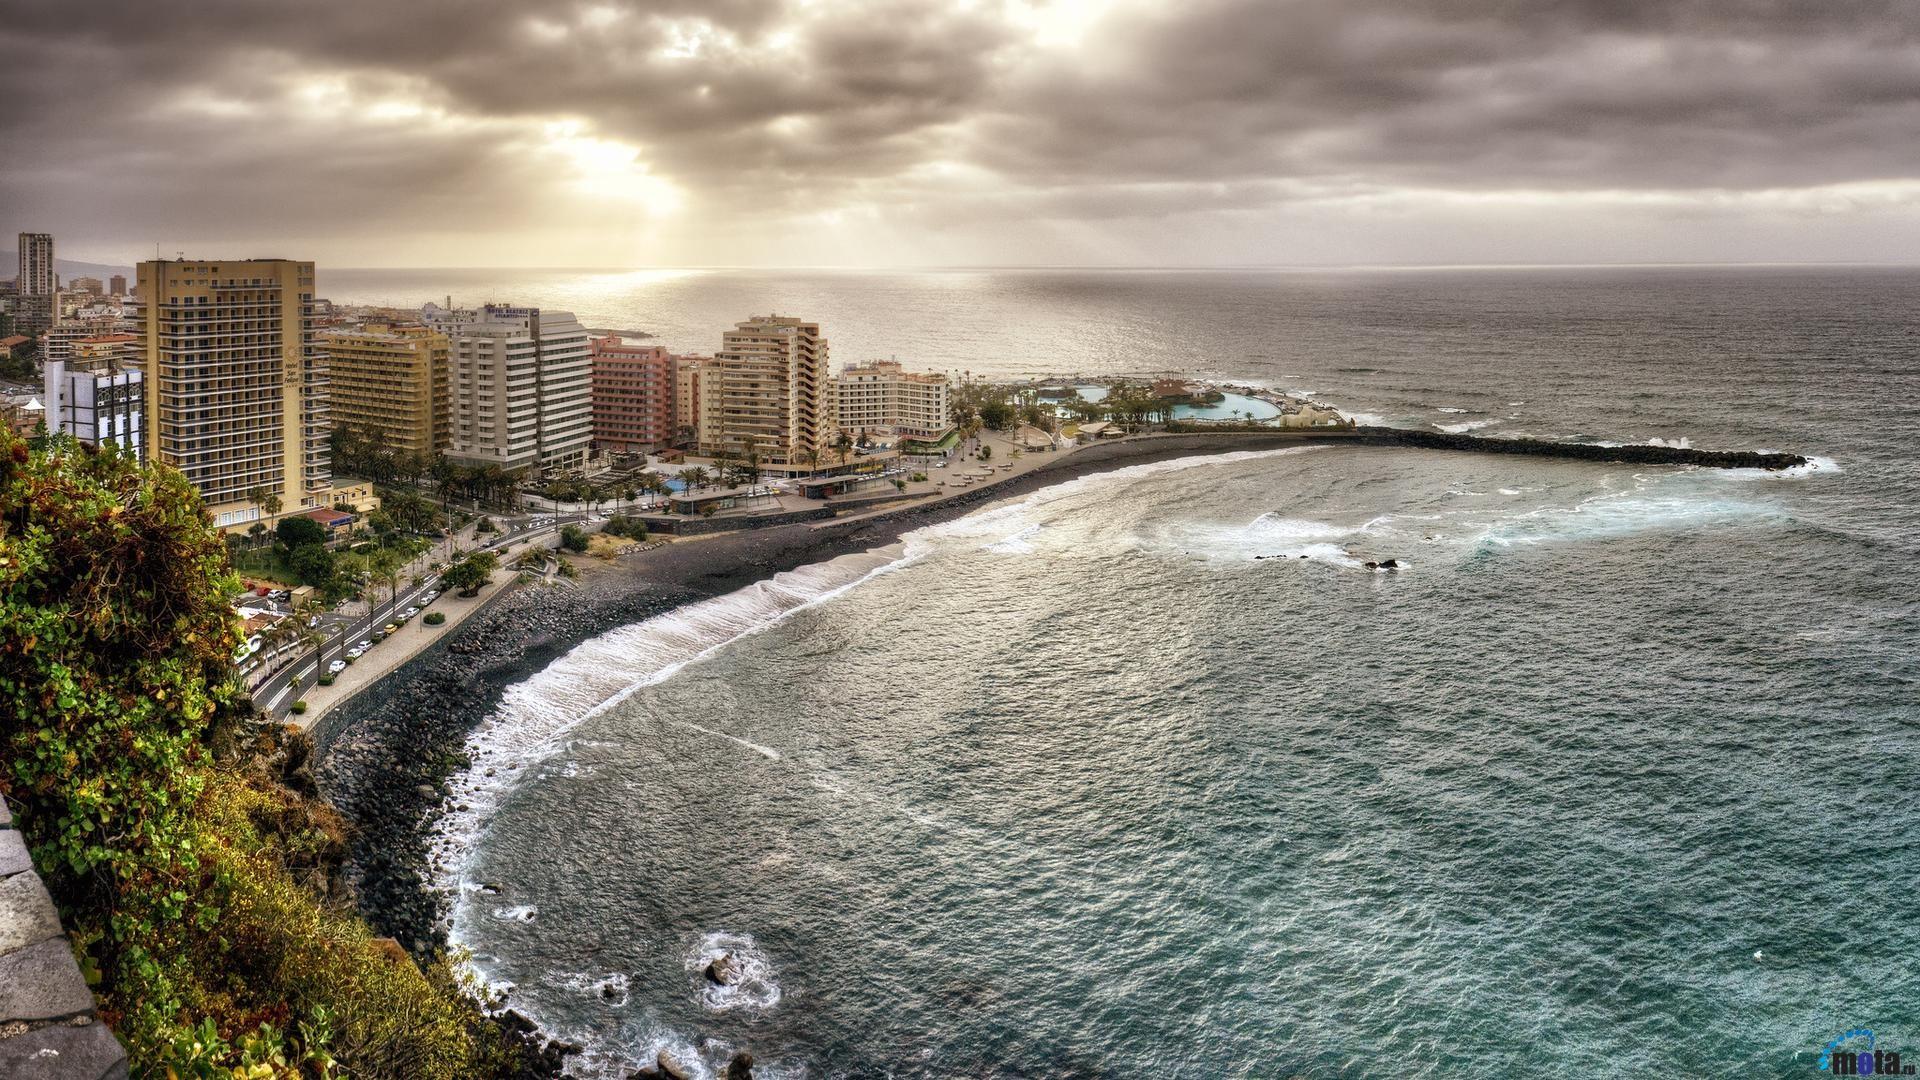 Gran Canaria Hd Desktop Wallpaper Widescreen High Definition